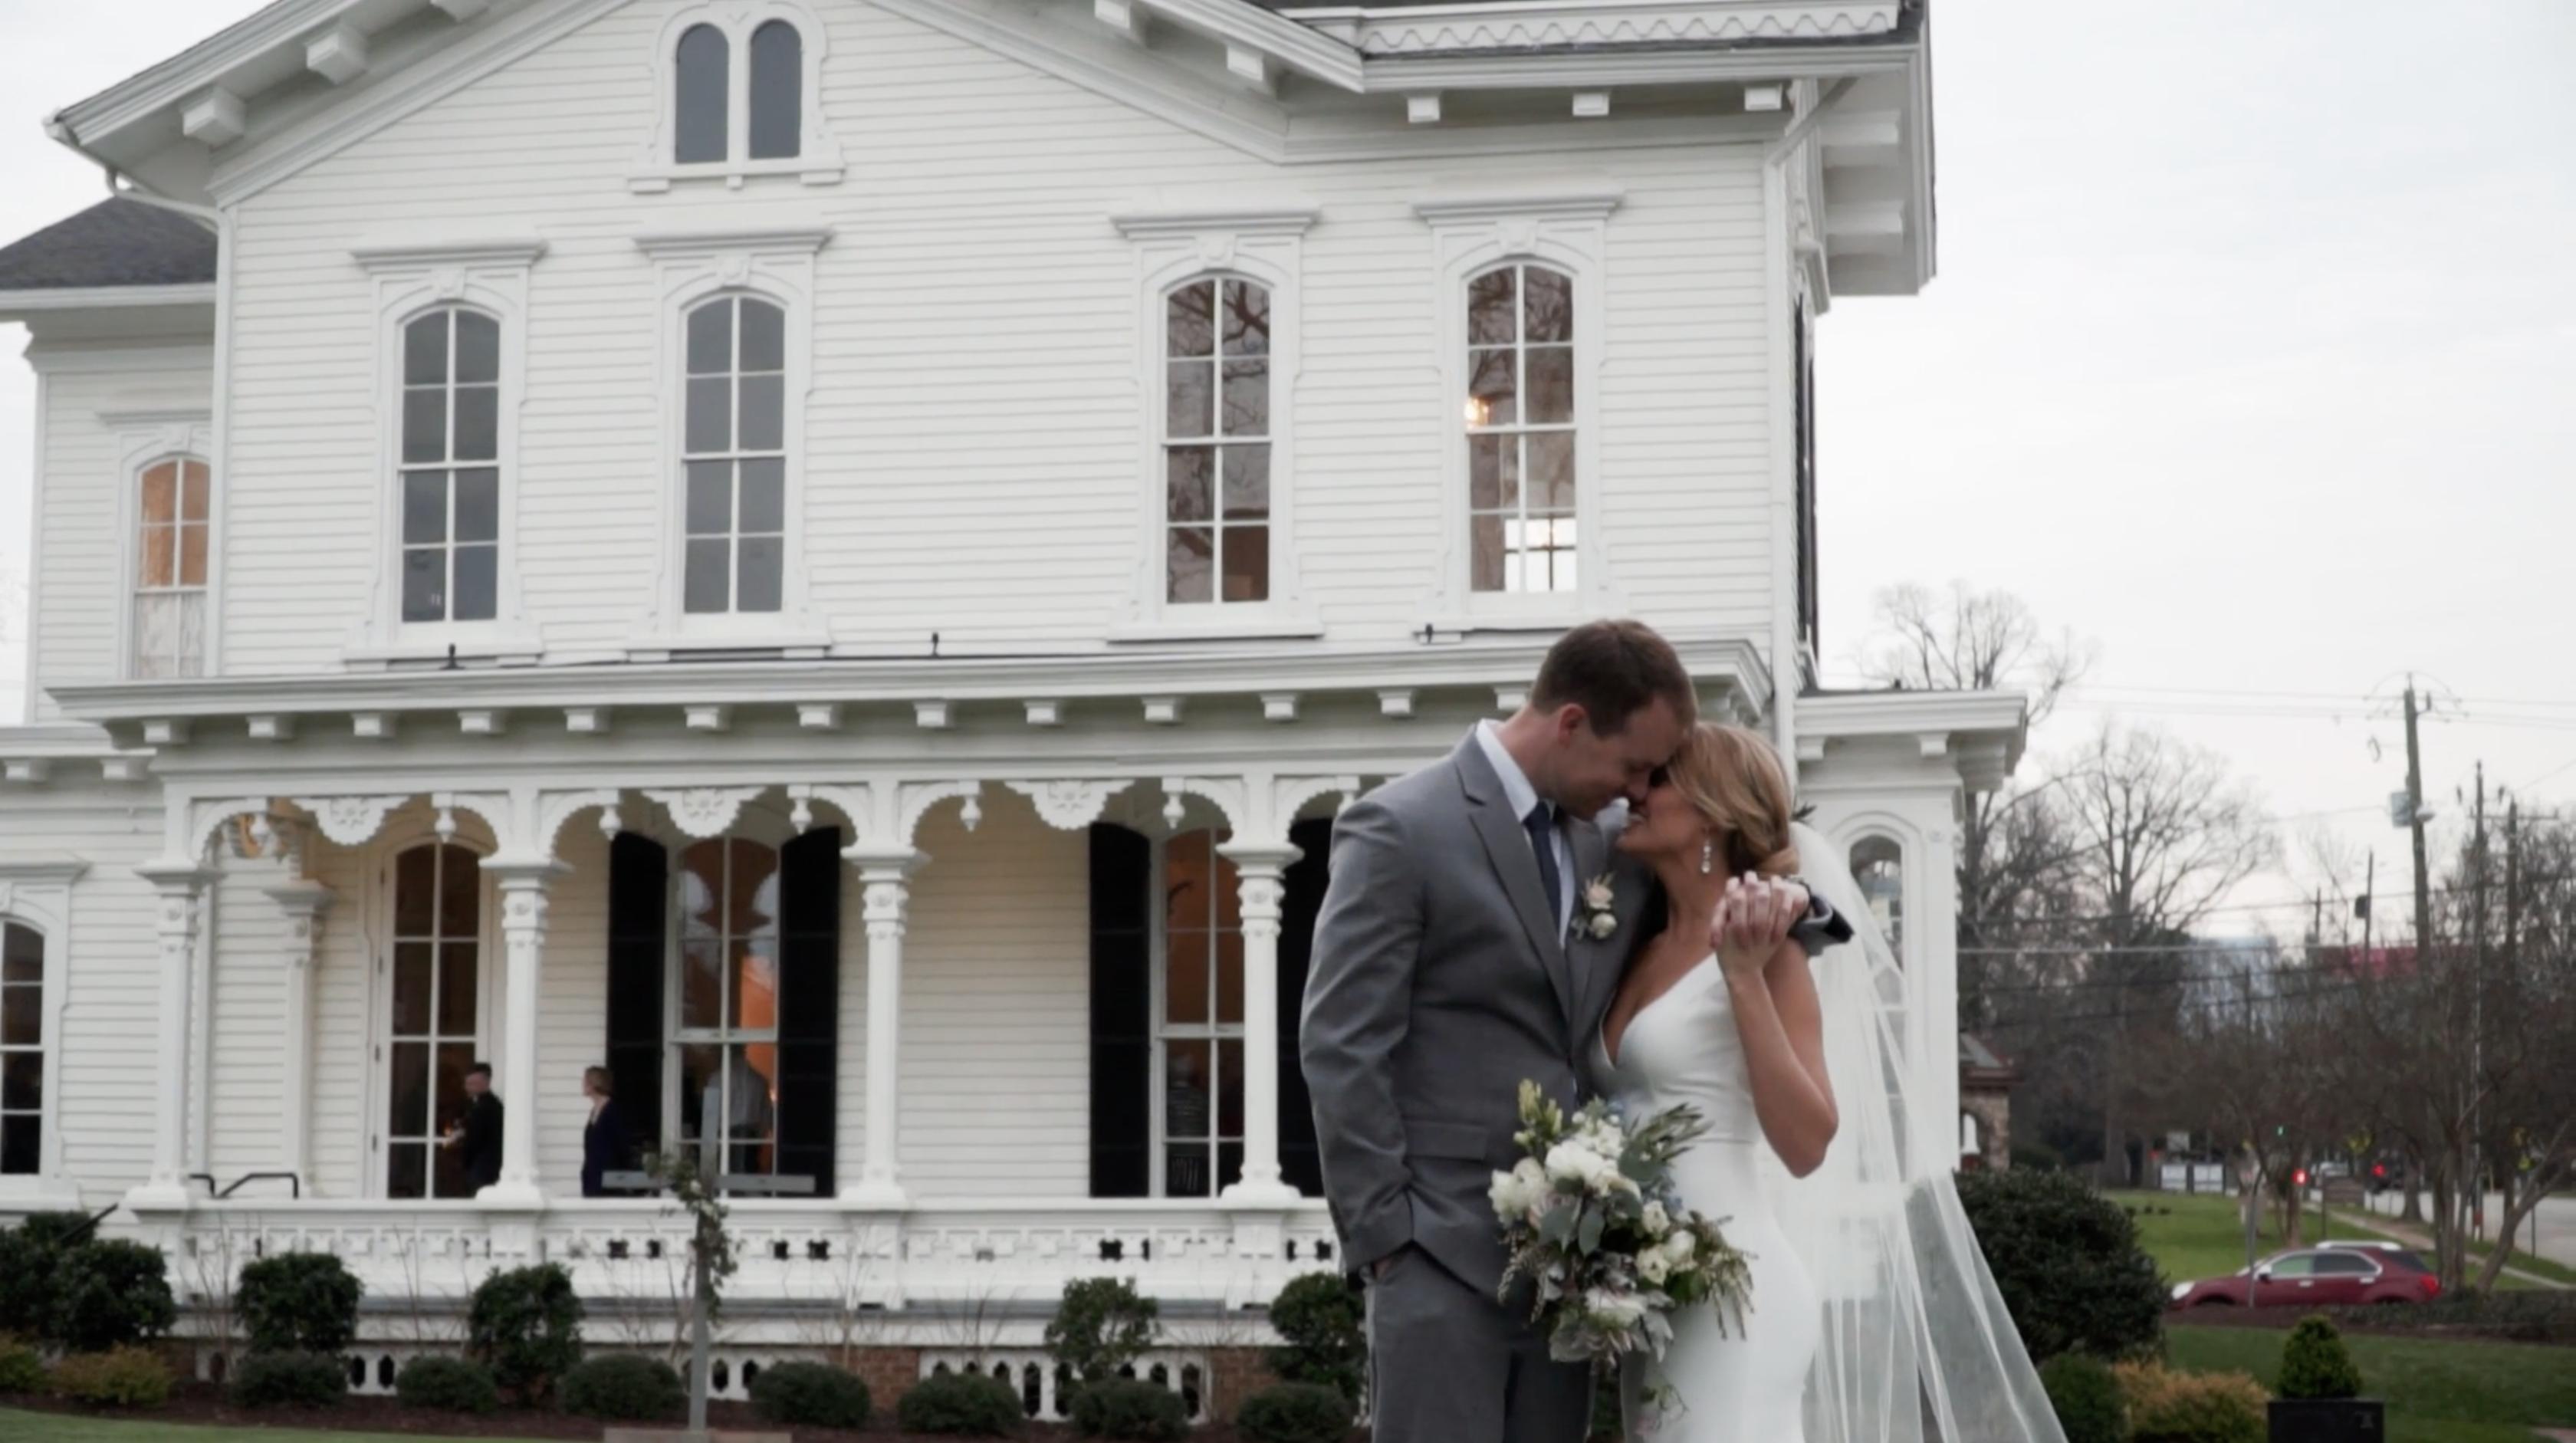 Sarah + Clint | Raleigh, North Carolina | Merrimon-Wynne House